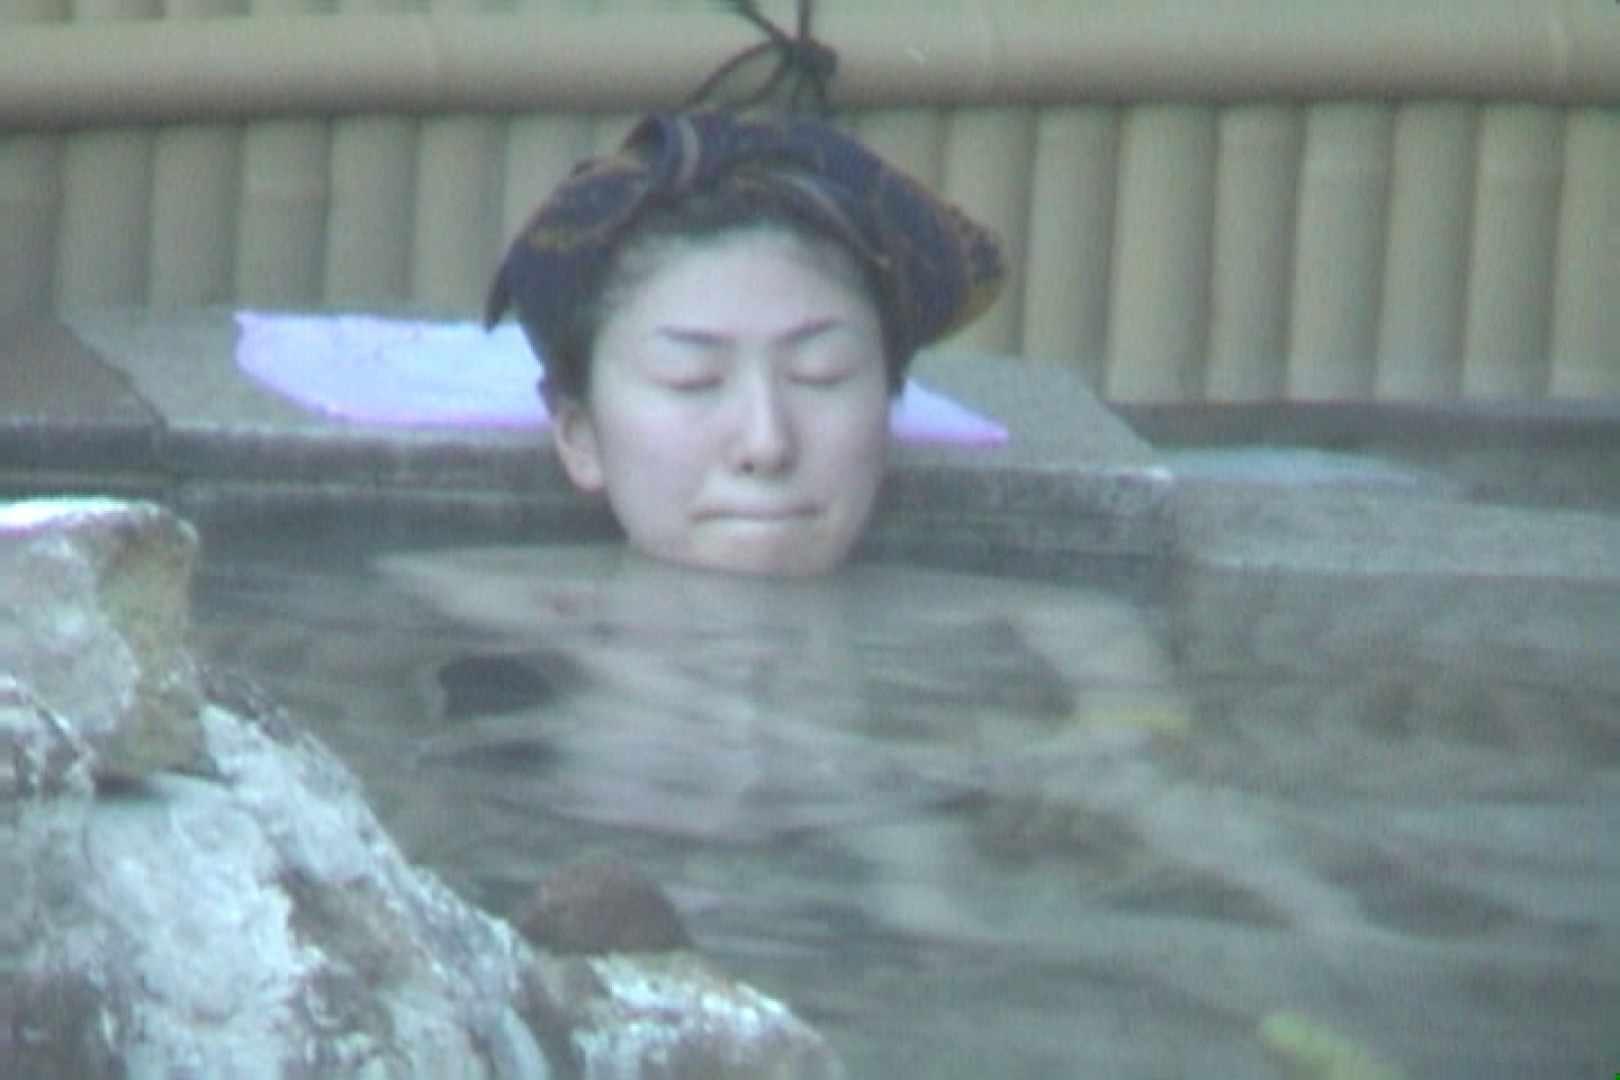 Aquaな露天風呂Vol.607 盗撮シリーズ | 露天風呂編  107PIX 87